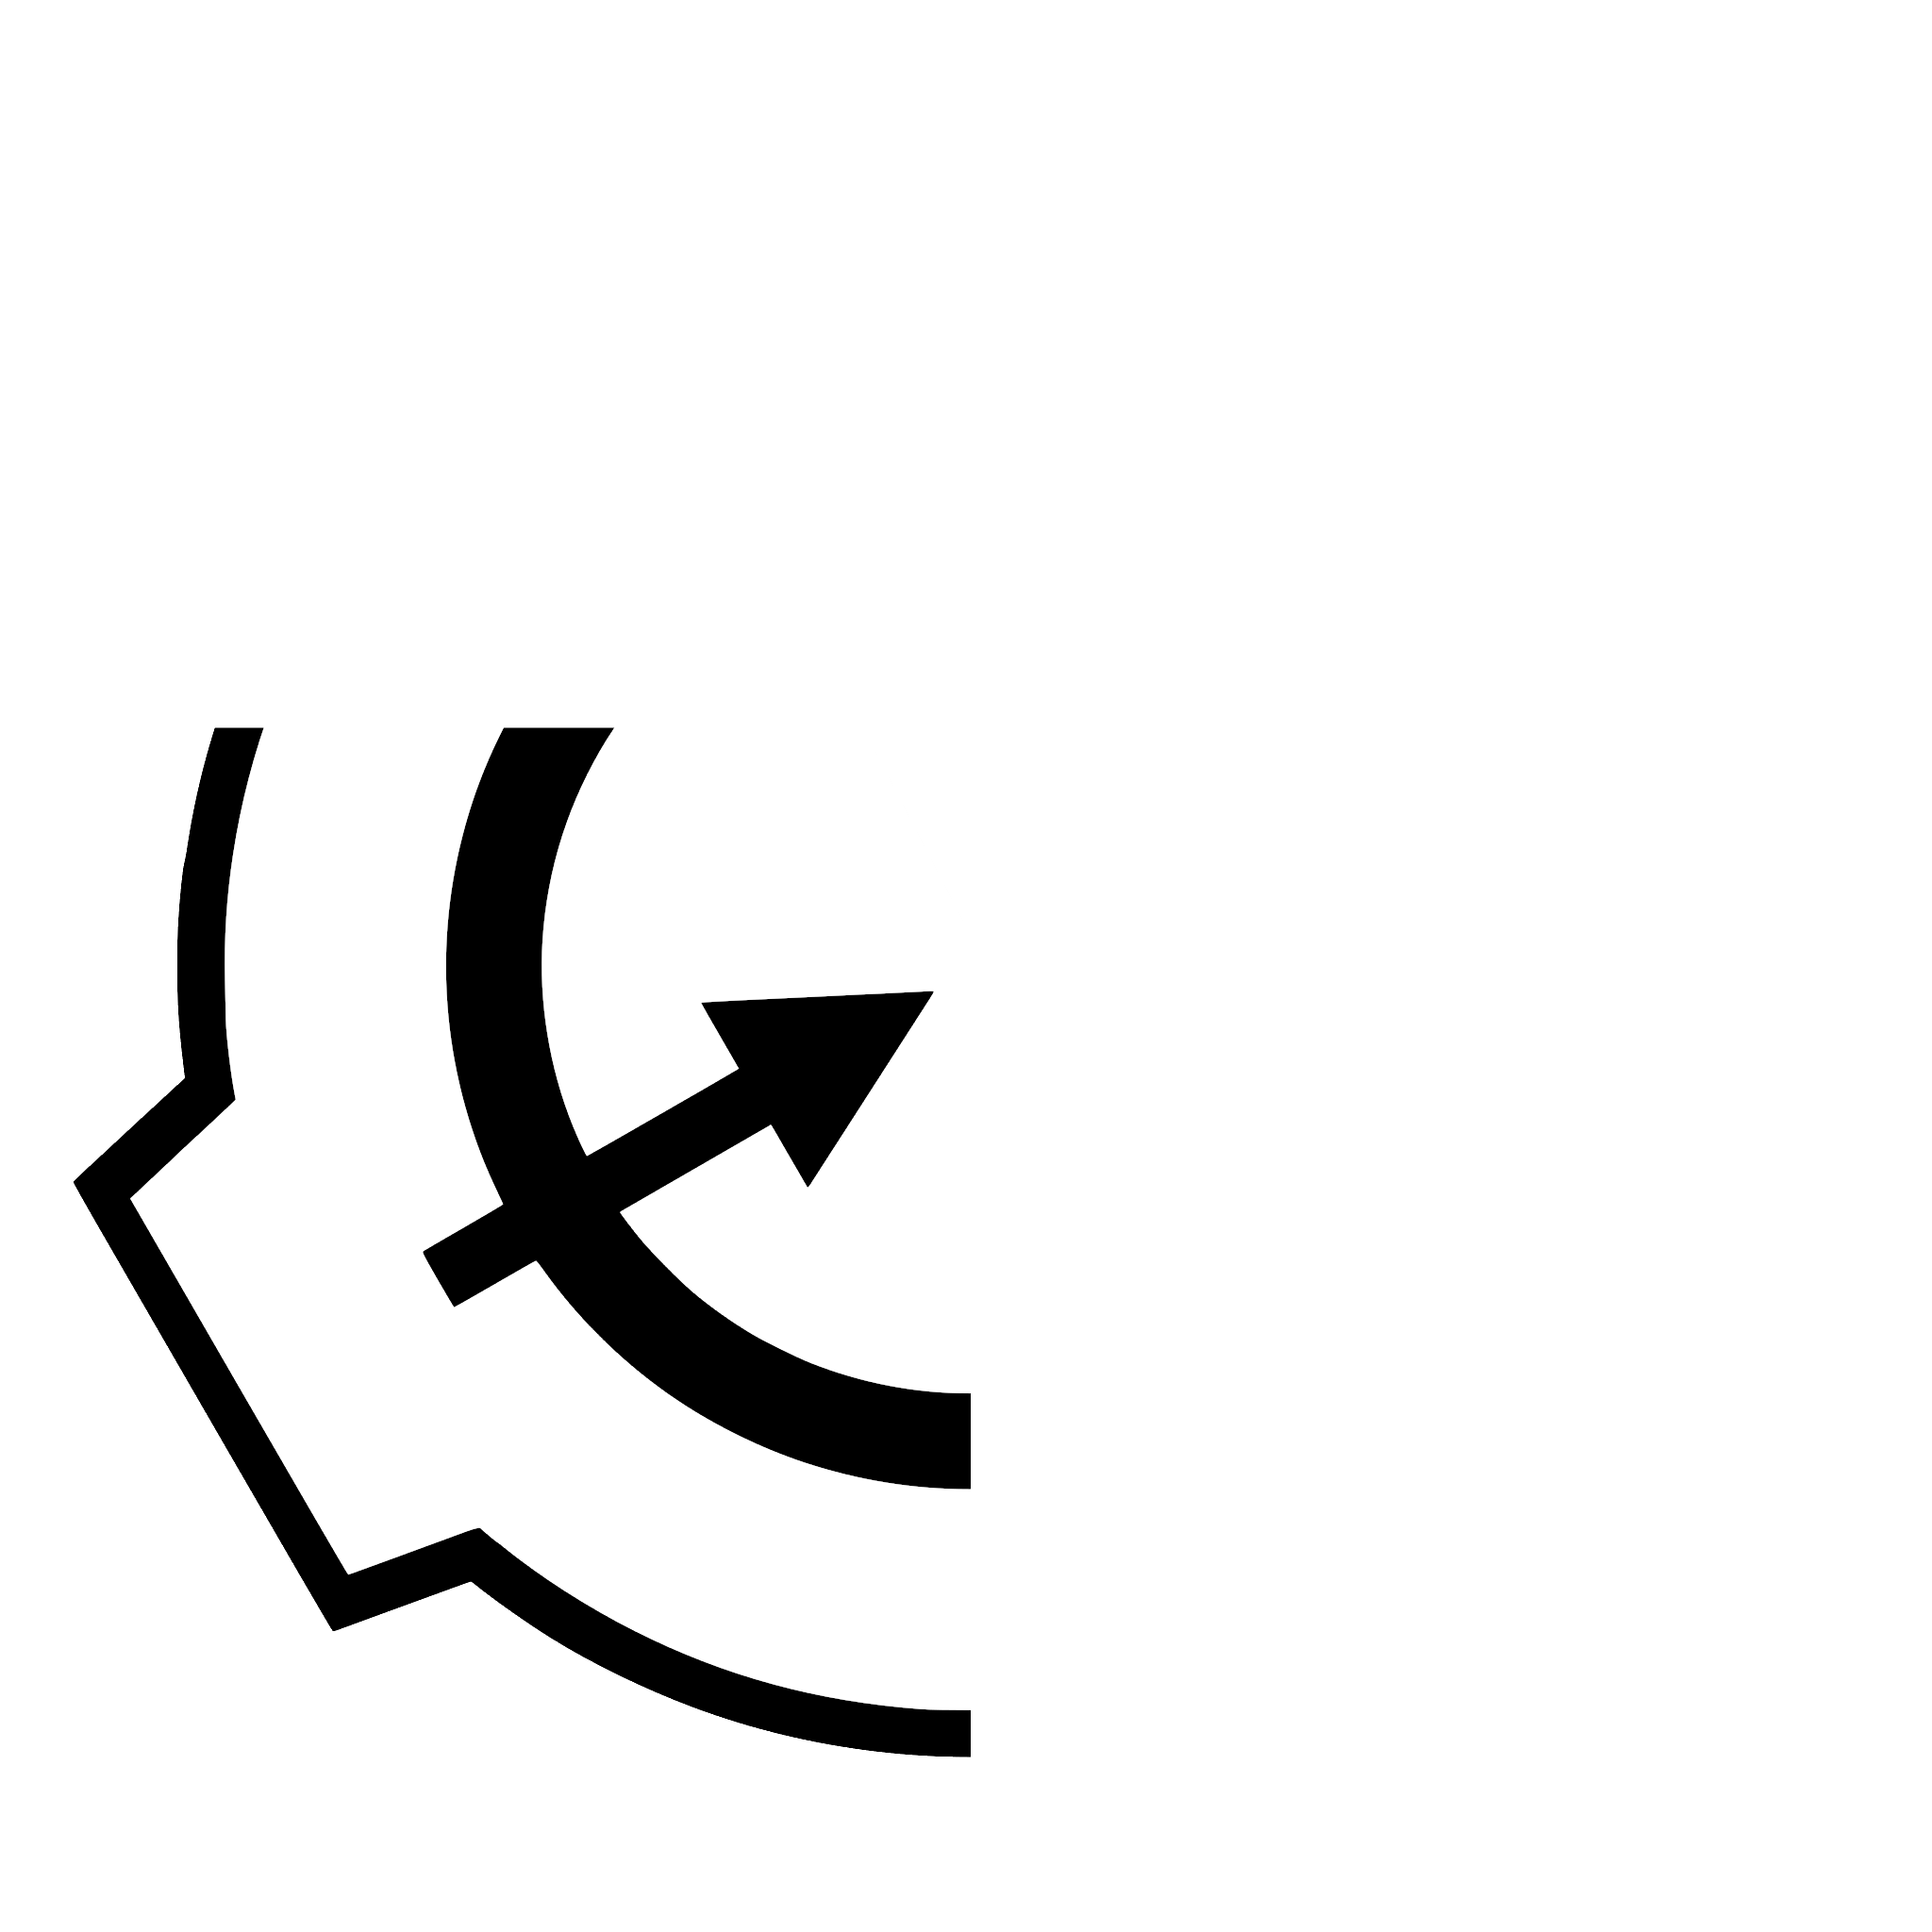 SCP_Foundation_(emblem)_cockroach_left.png